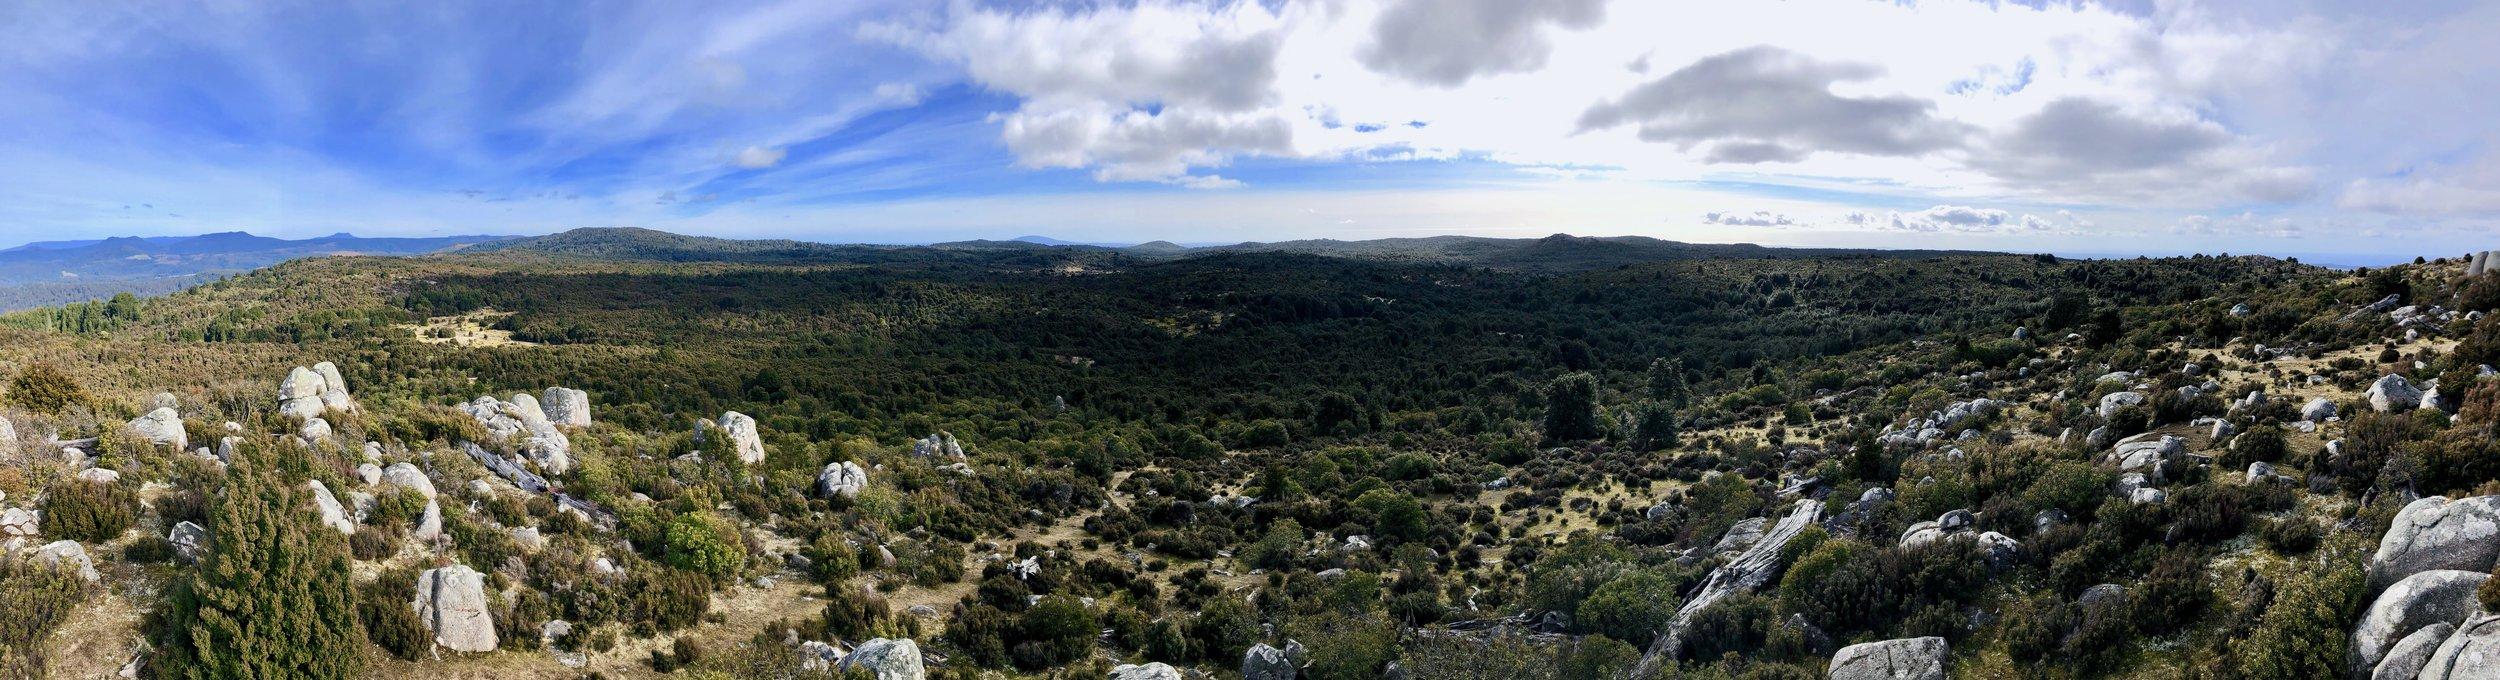 Beloved Tassie - Blue Tier Reserve, Tasmania